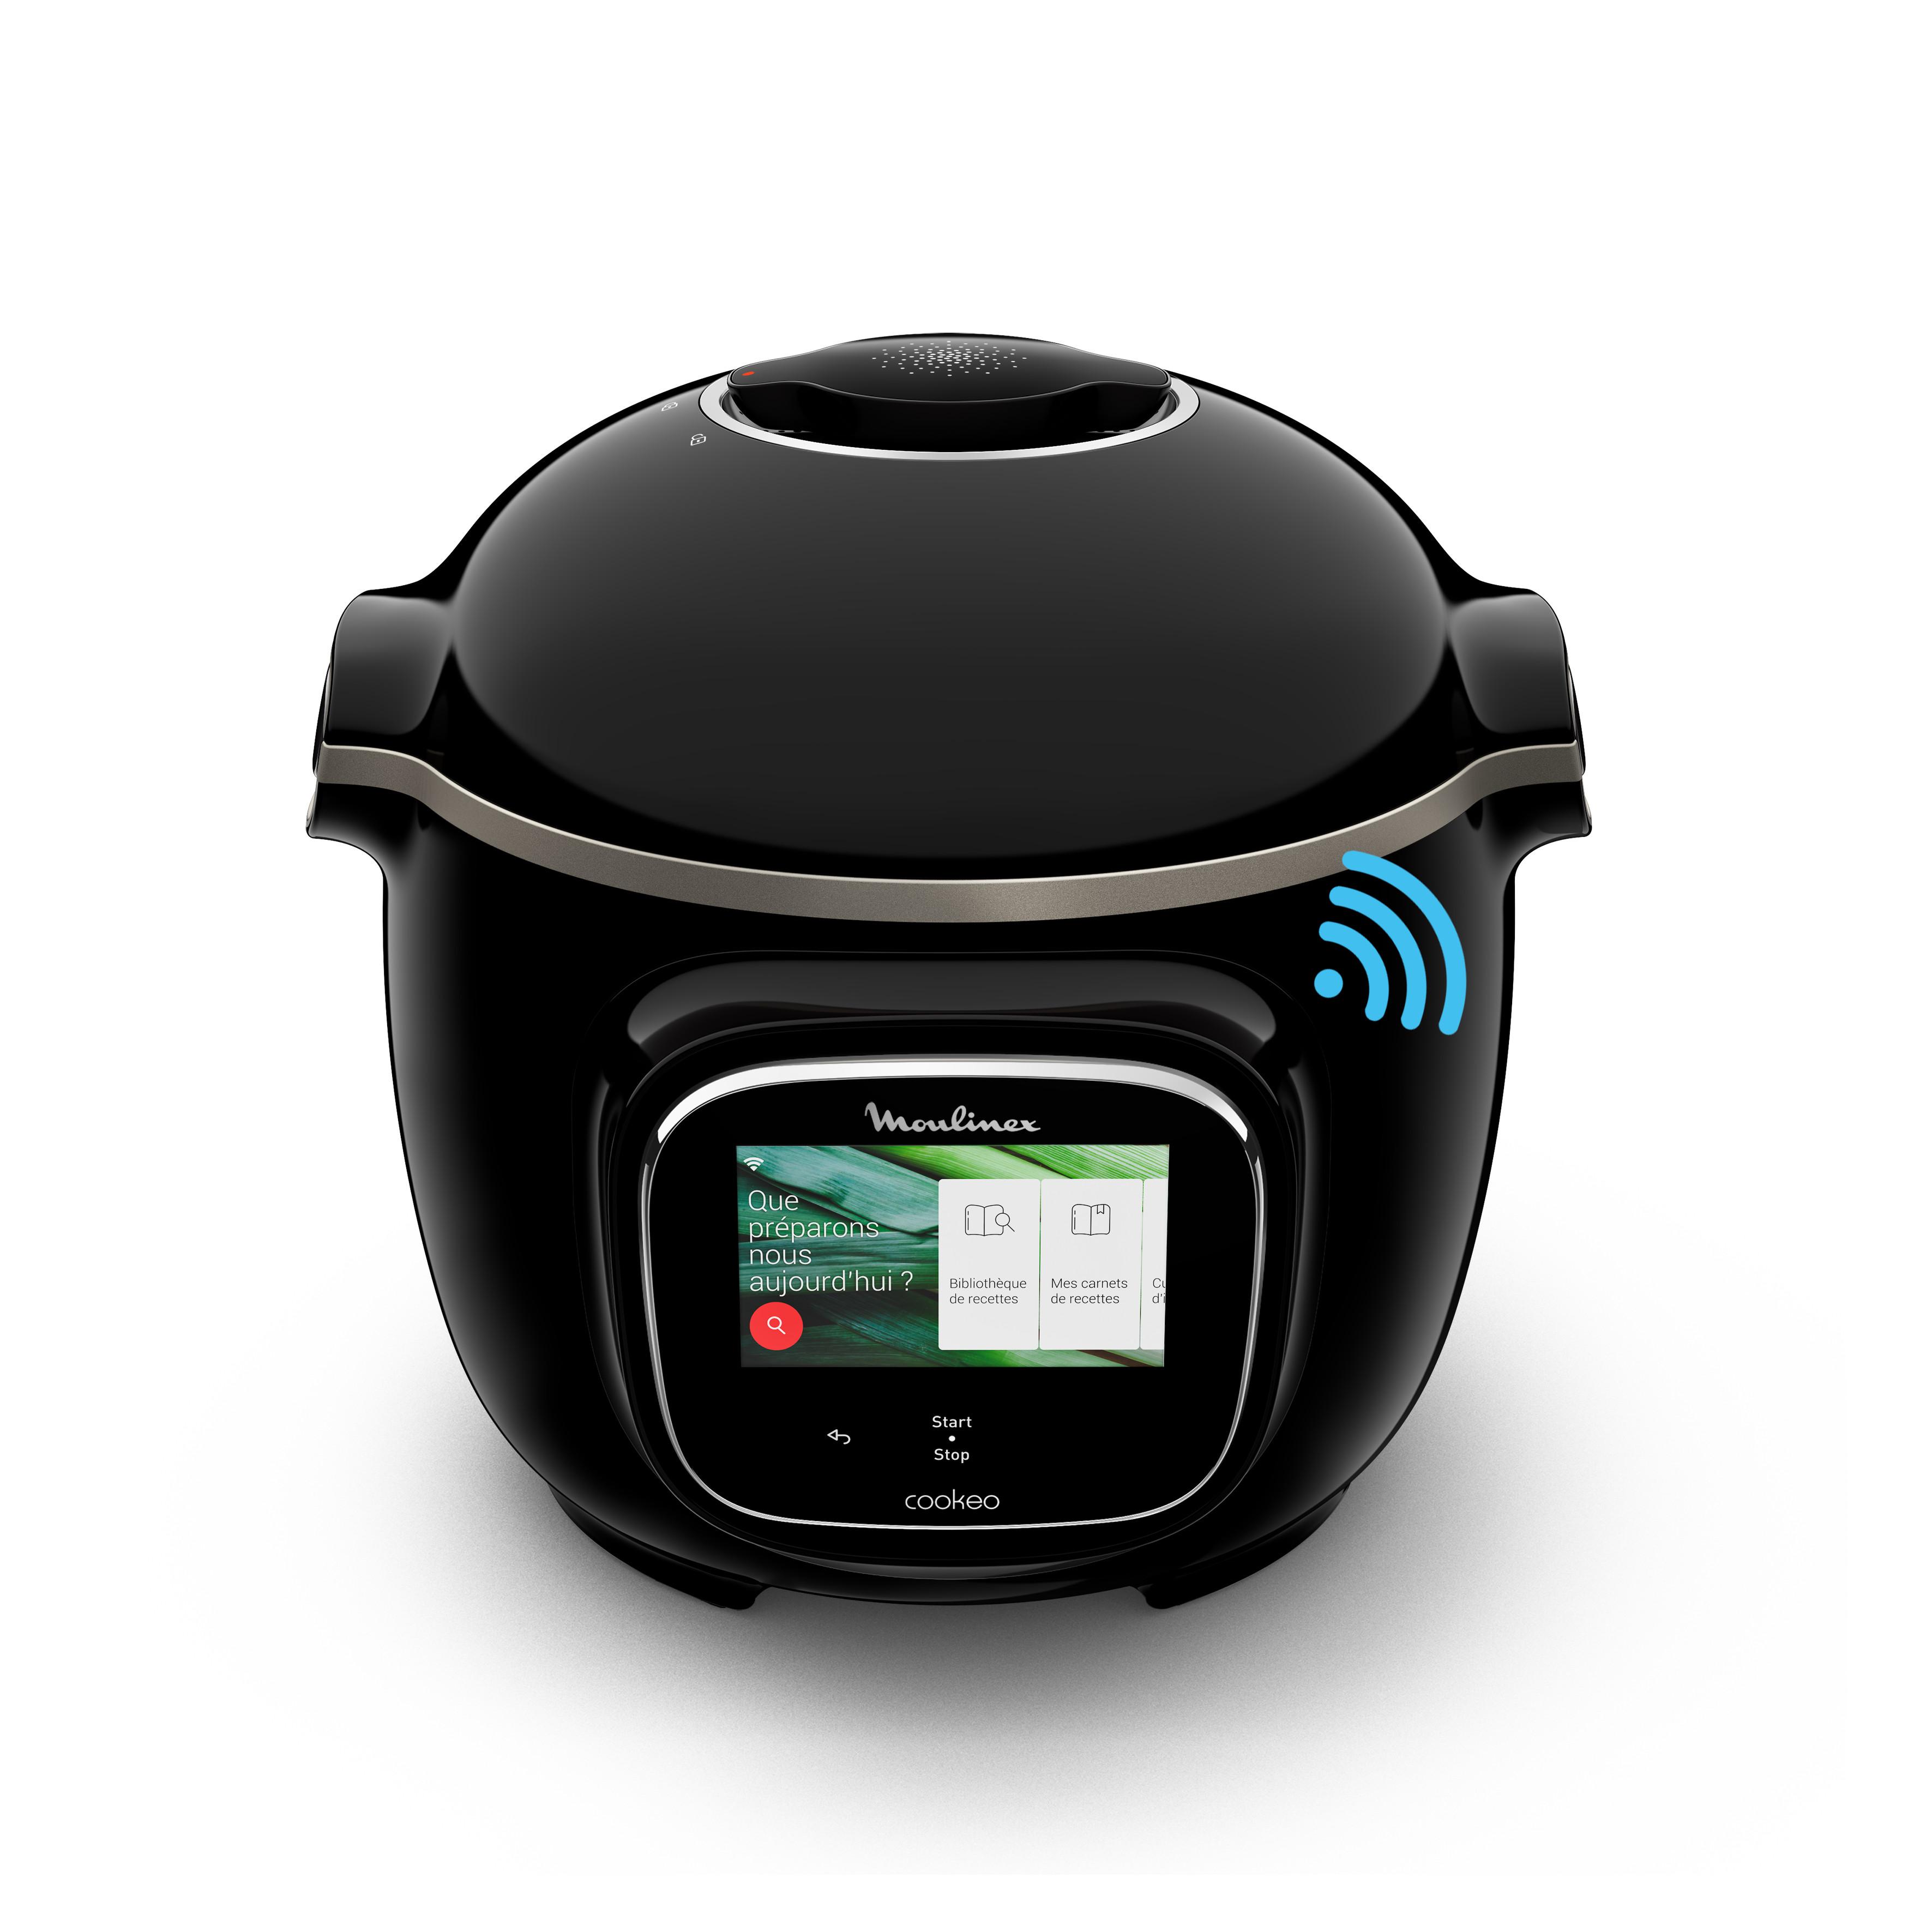 Code promo Marmiton : Moulinex Cookeo Touch Wifi à tester gratuitement